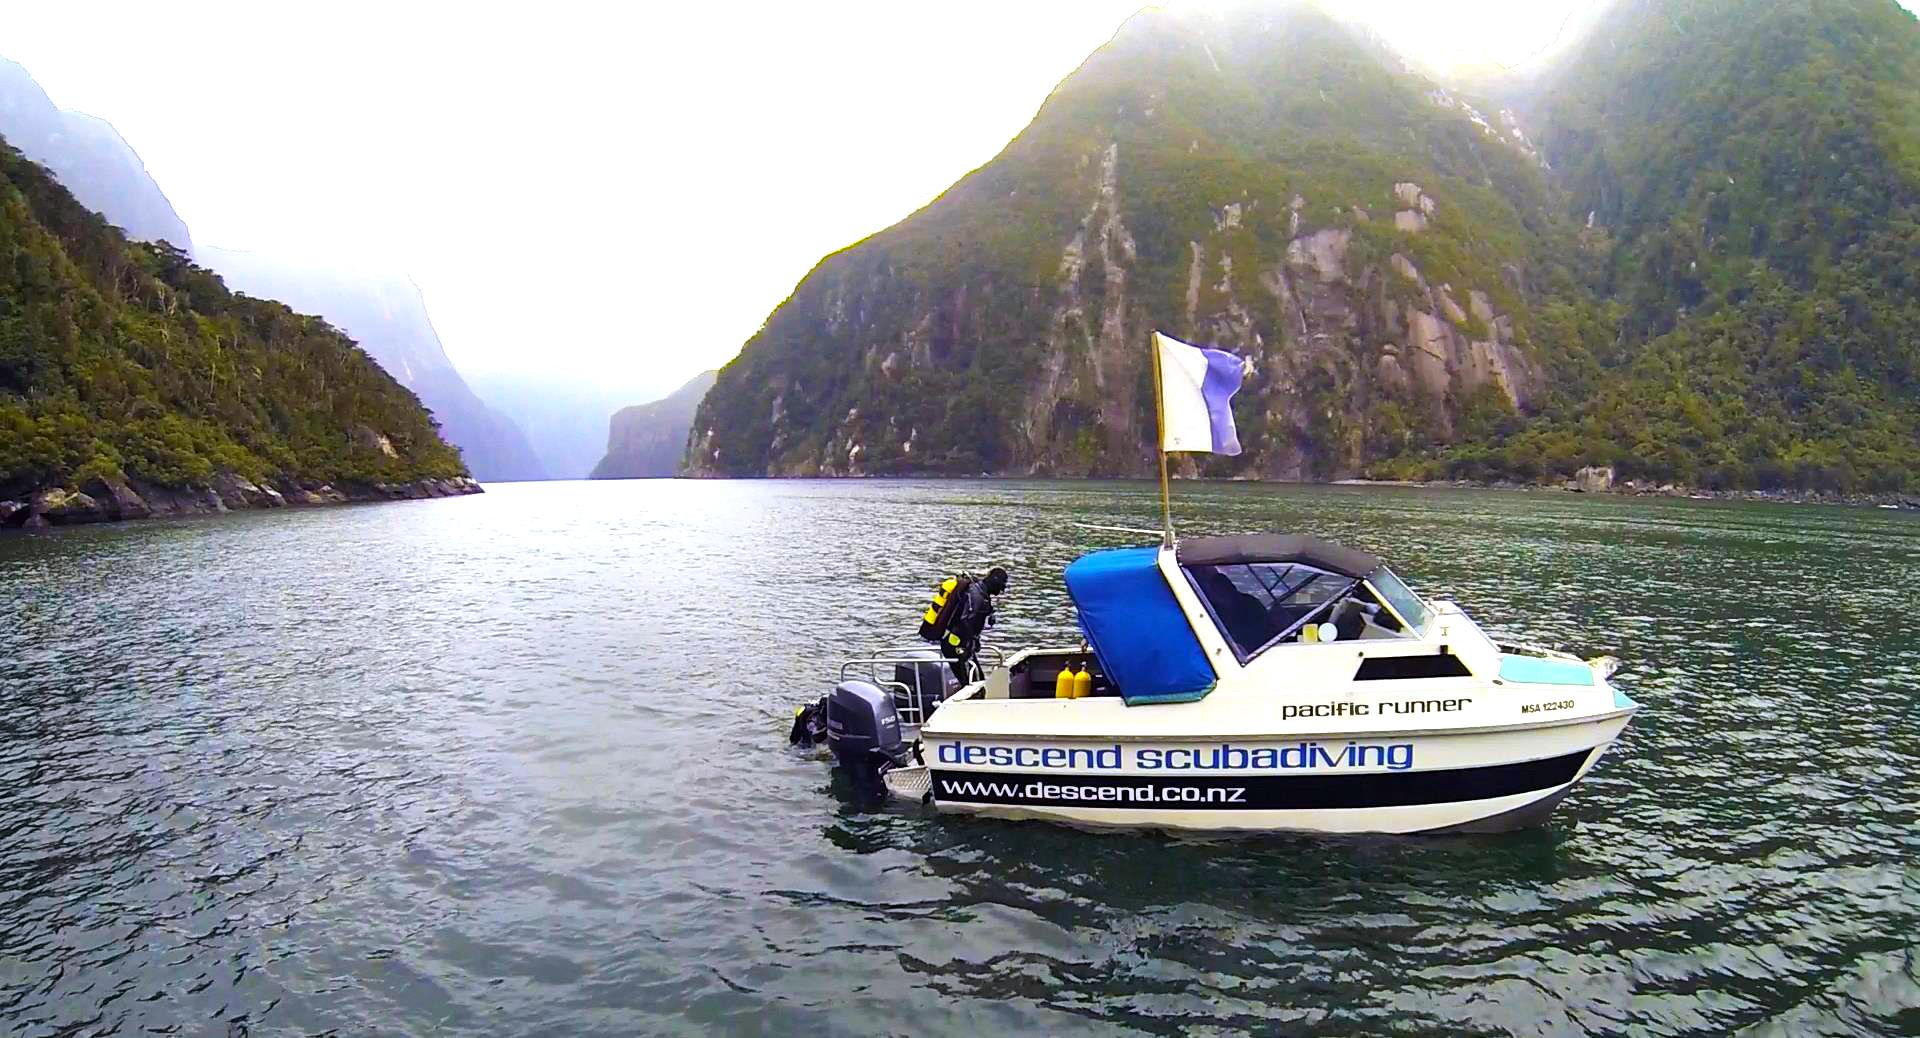 Vessel Pacific Runner - 6m Maitland Powercat